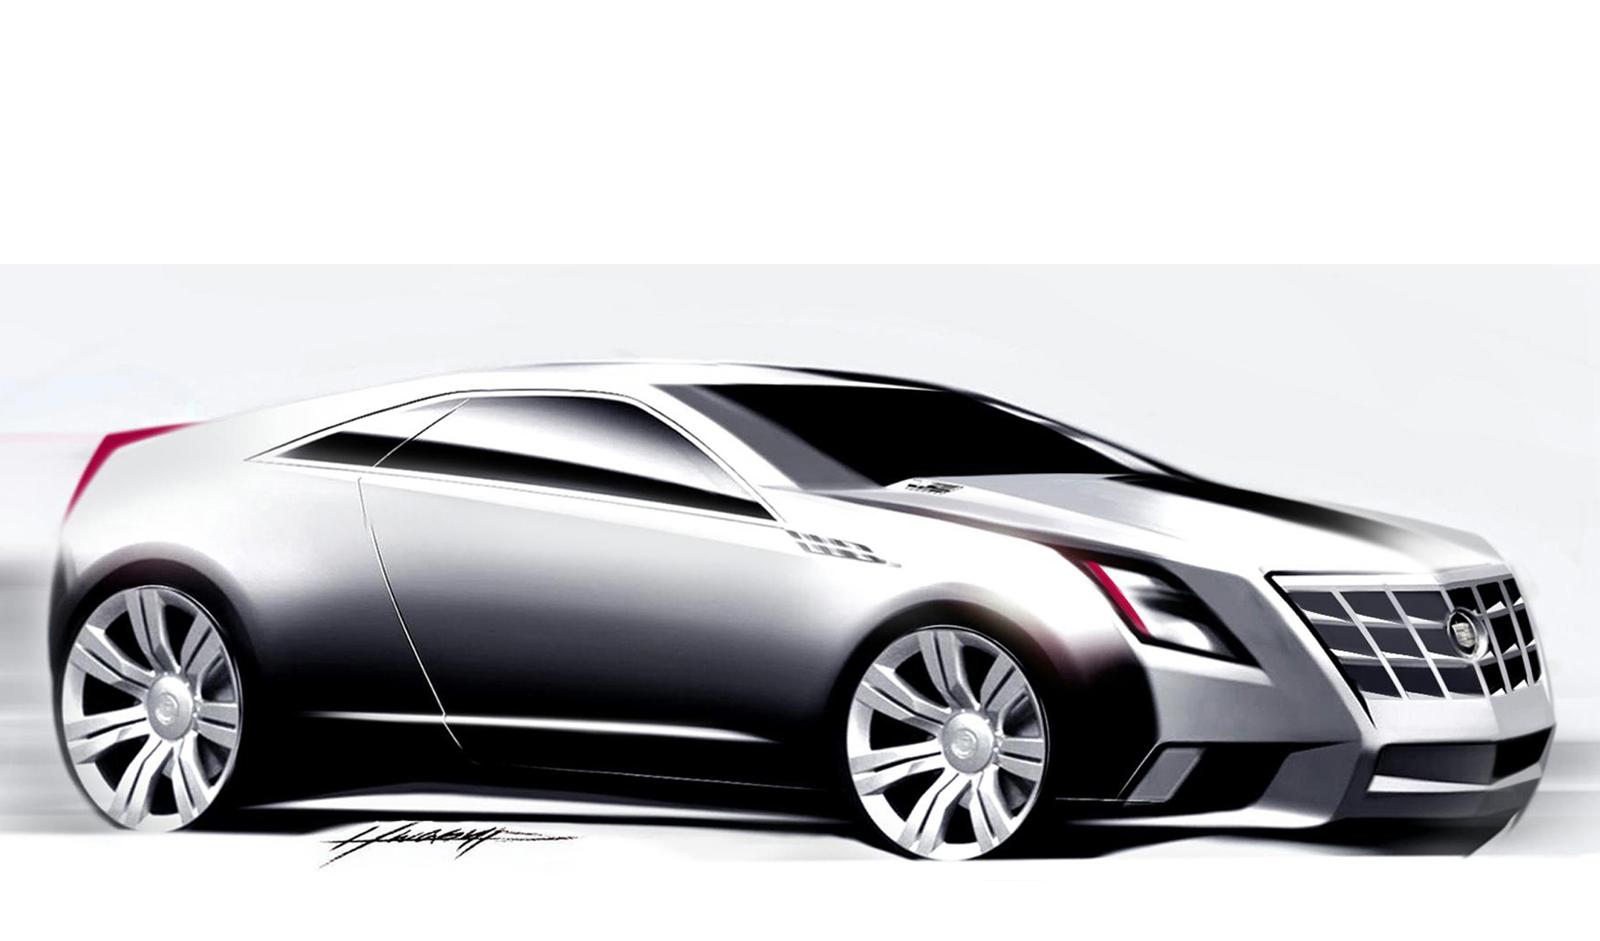 Cadillac Cts Cts V Faq 2009 Ctc Coupe Information